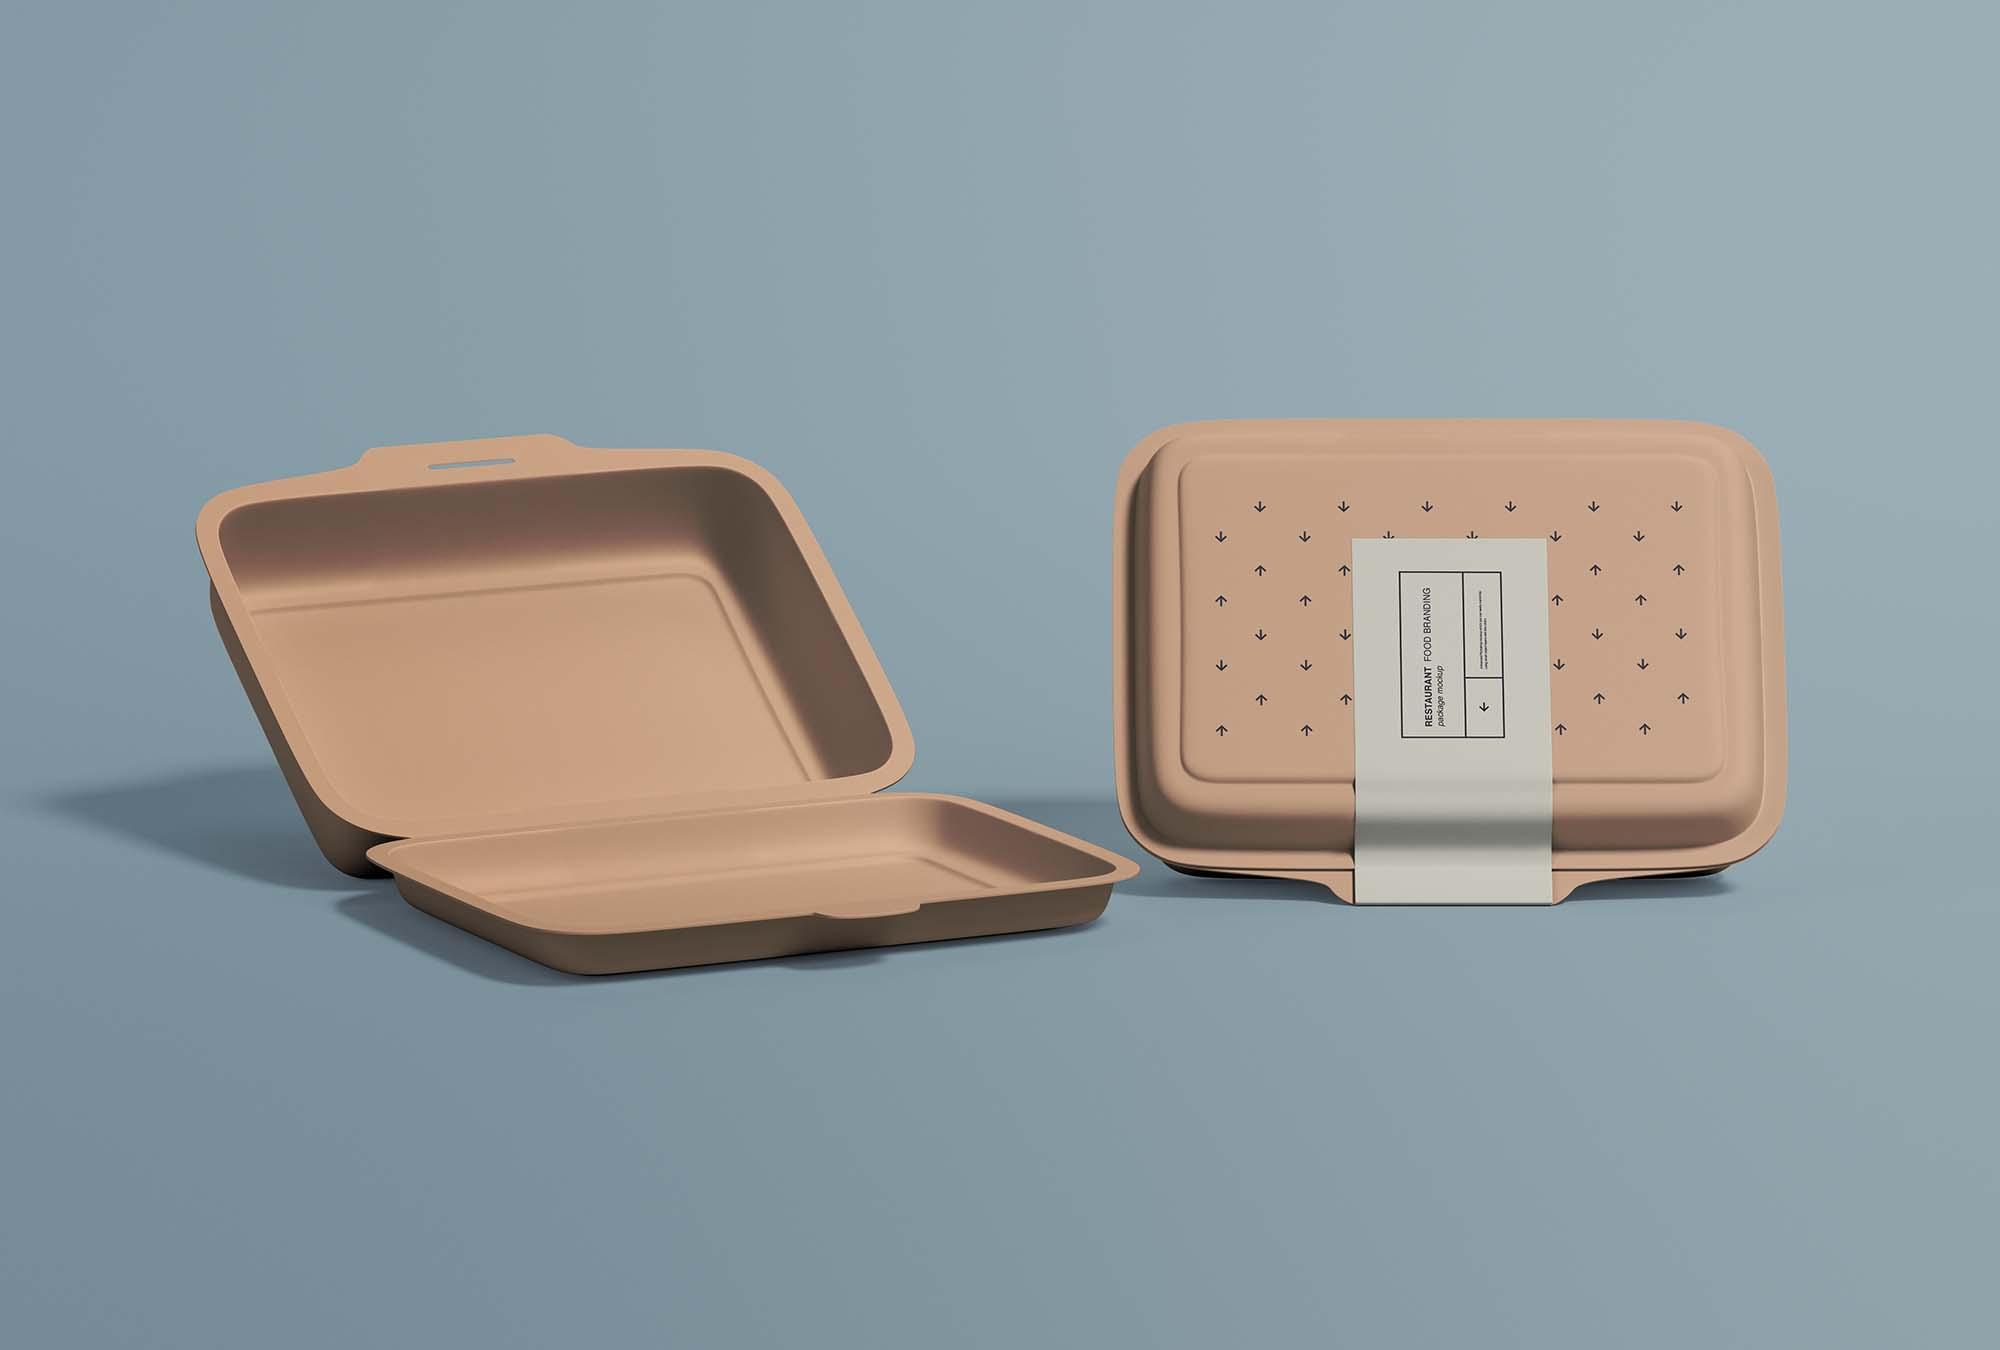 Restaurant Food Packaging Mockup 2